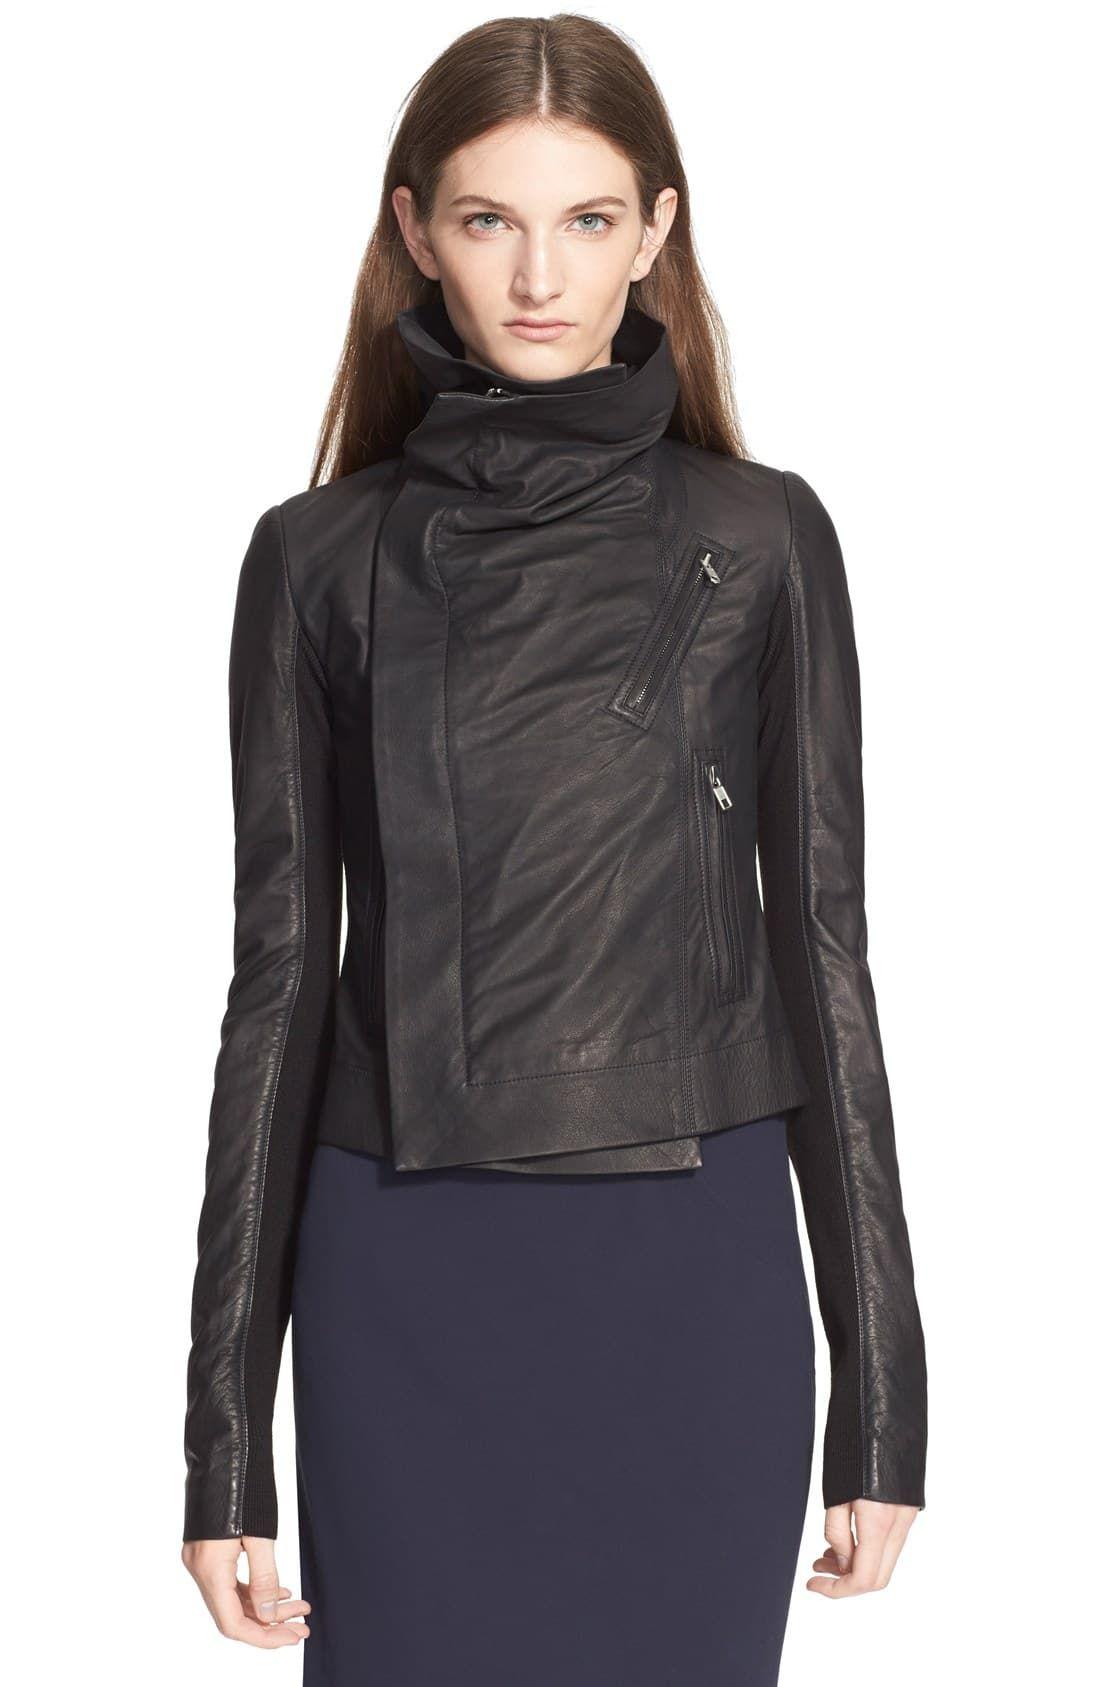 1002f9536 Women's Rick Owens 'Classic' Leather Biker Jacket, Size 10 US / 46 ...